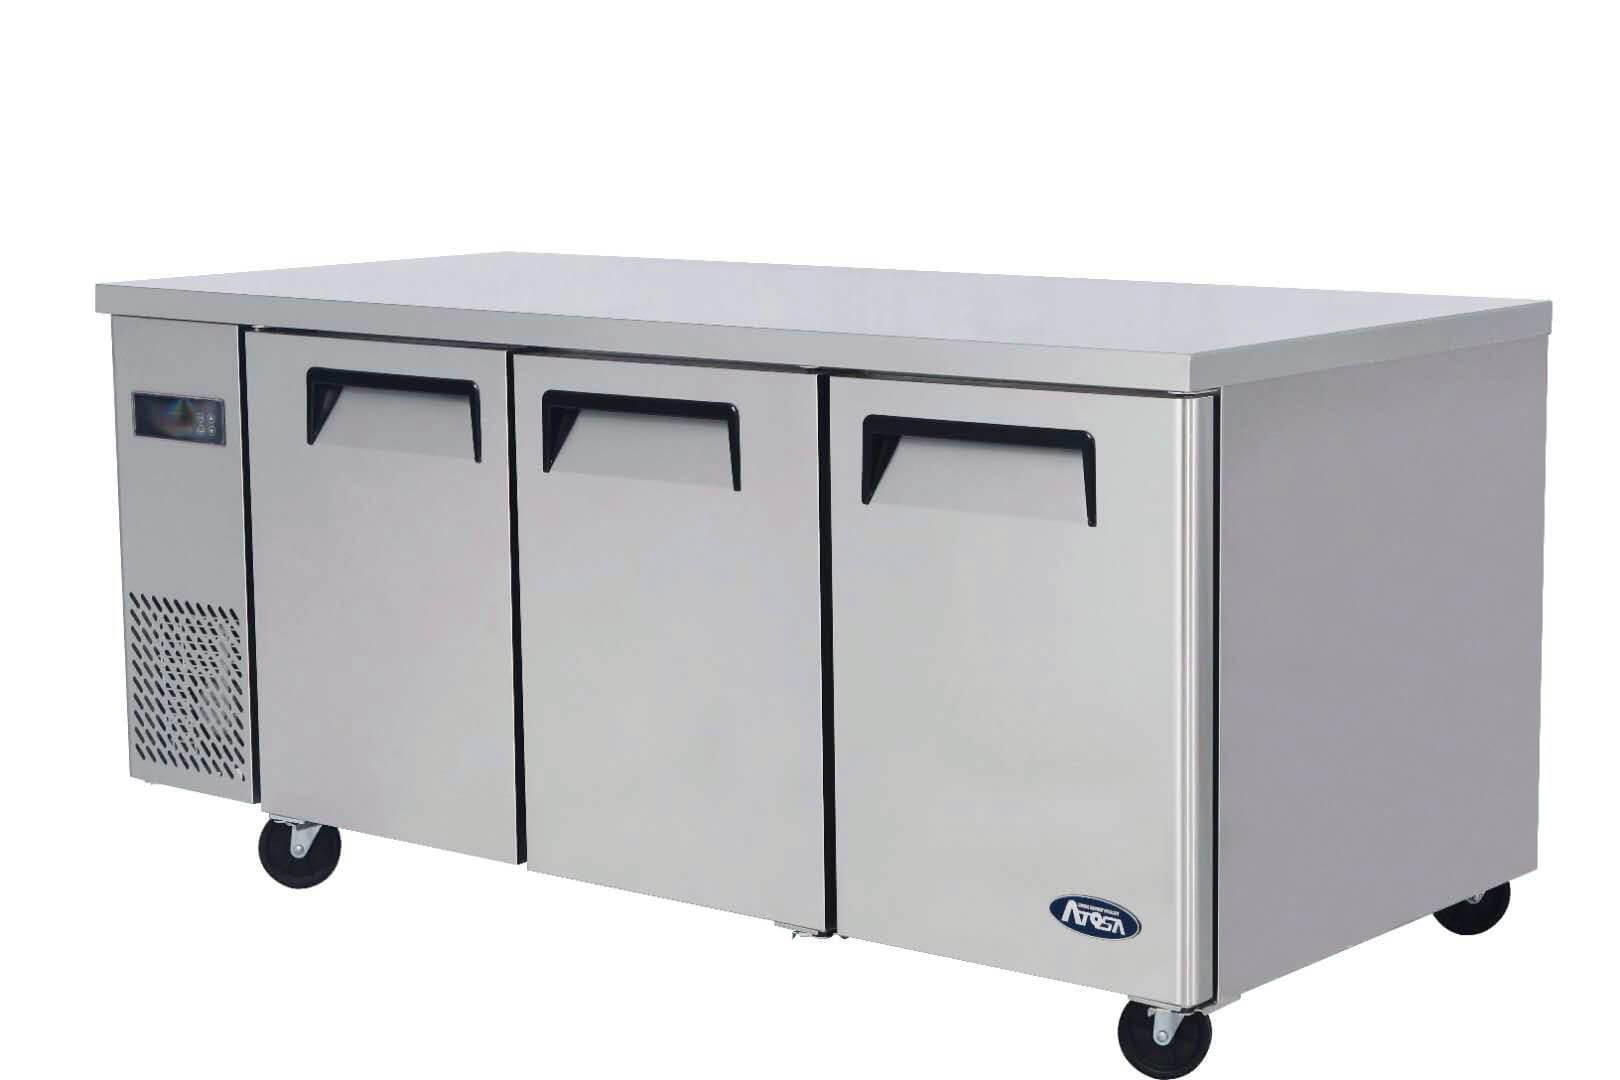 Atosa YPF9040 Undercounter Refrigerator 1800 mm